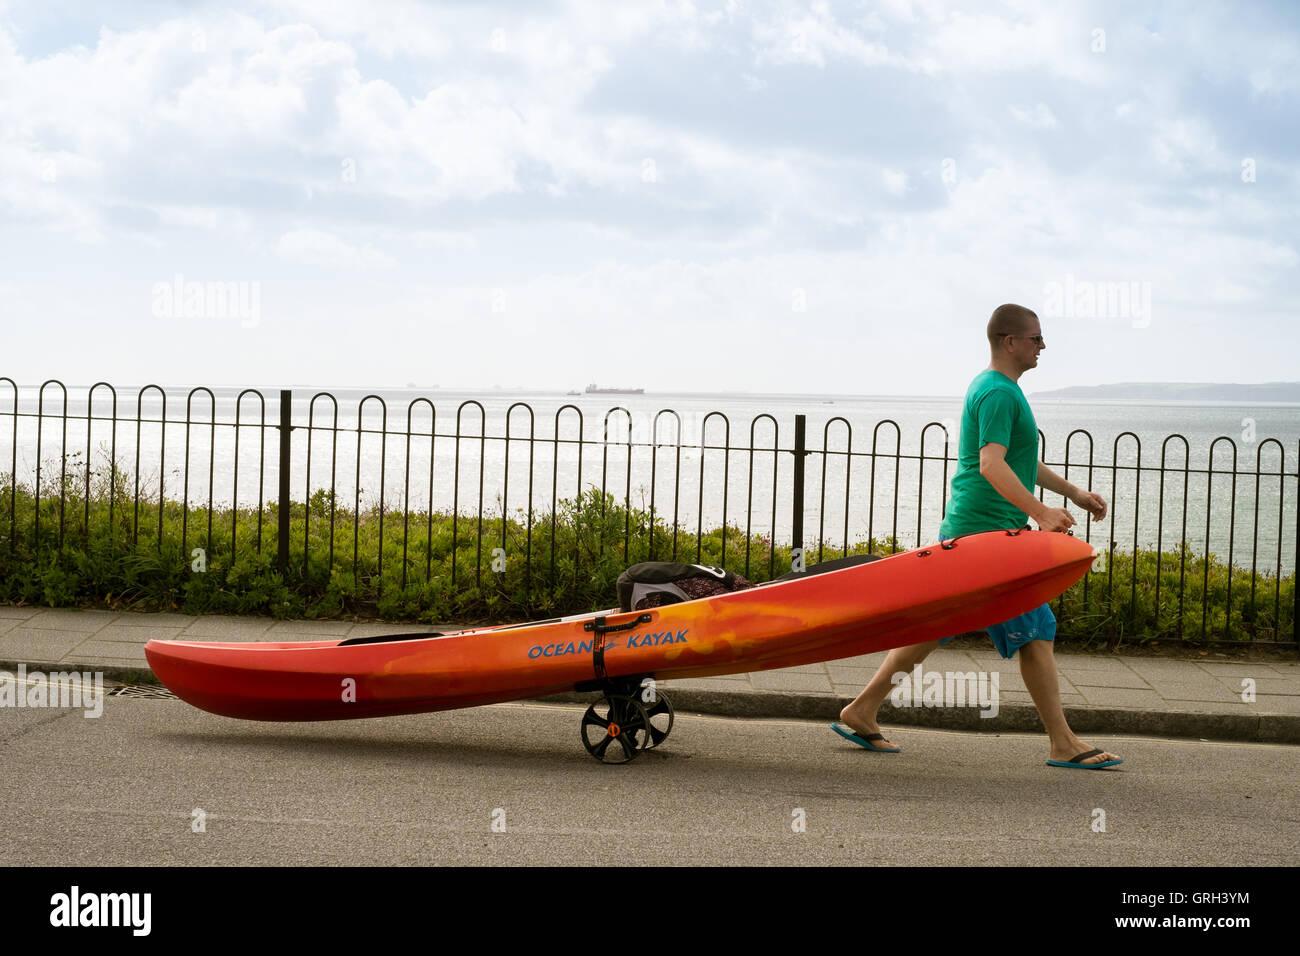 Falmouth, UK. 8th September, 2016. Man pulling his kayak on a trailer to Gyllyngvase Beach, Falmouth Credit:  Mick - Stock Image